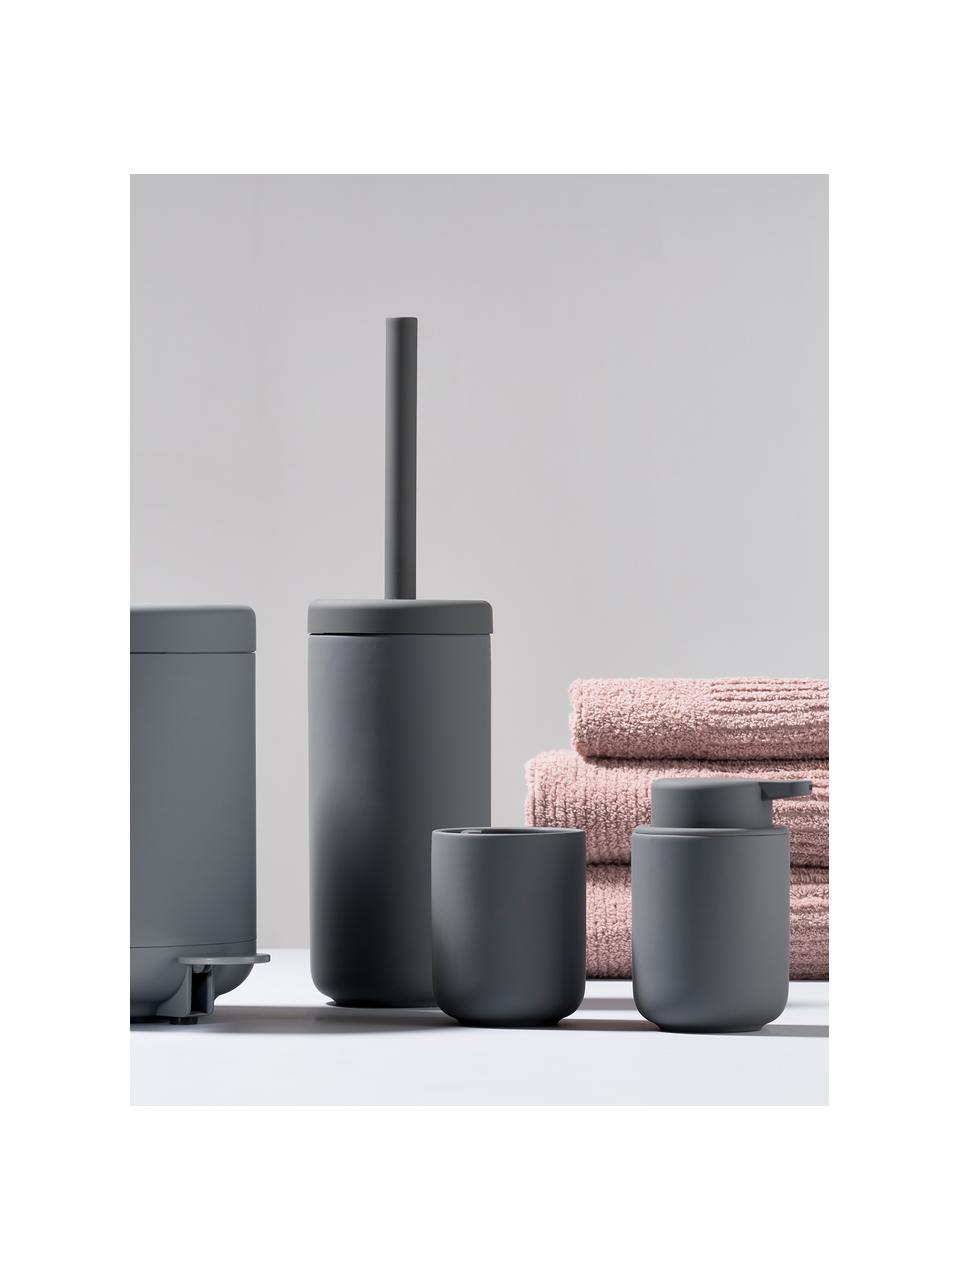 Porzellan-Seifenschale Ume, Porzellan, Grau, Ø 12 x H 3 cm